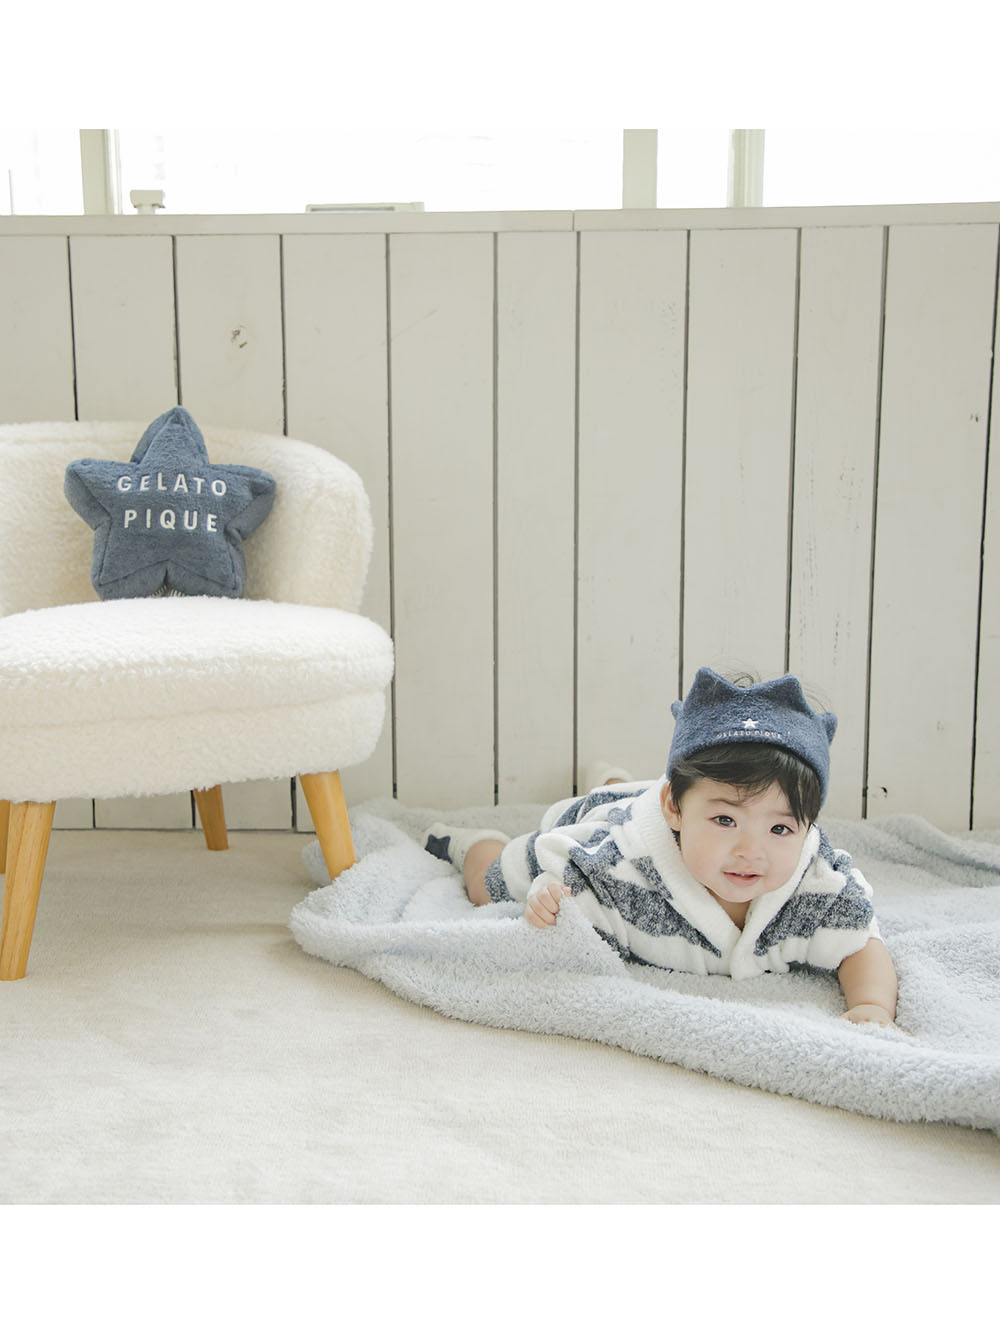 【BABY】'スムーズィー' baby 王冠ヘアバンド | PBGA212712